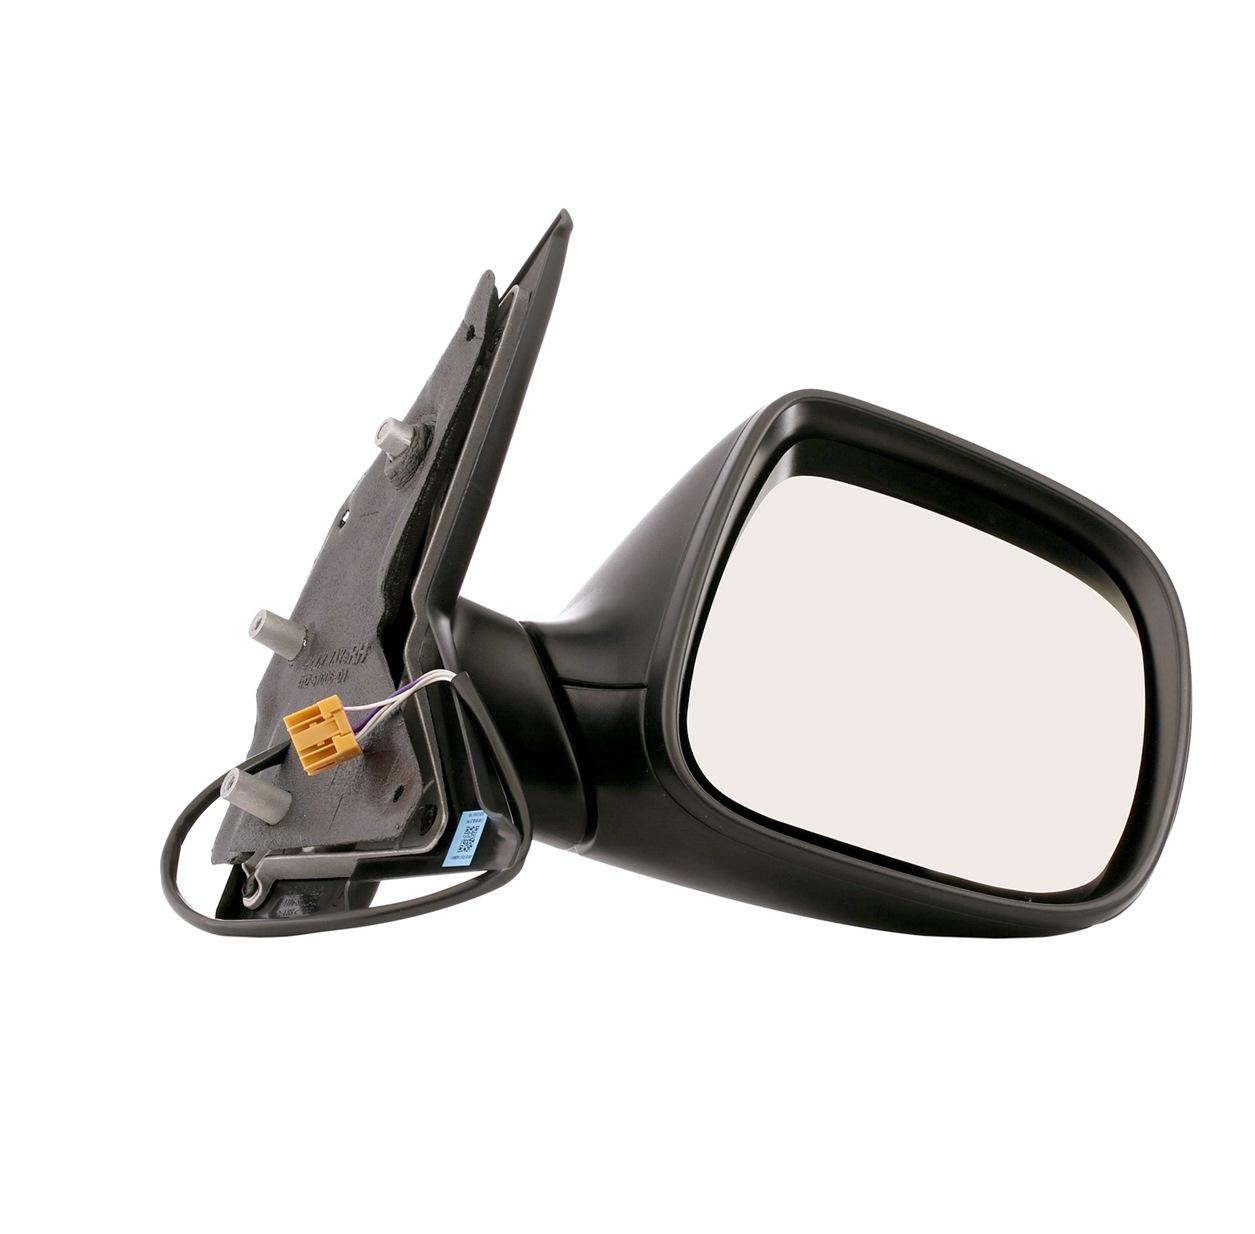 Seitenspiegel VAN WEZEL 5790806 Bewertung